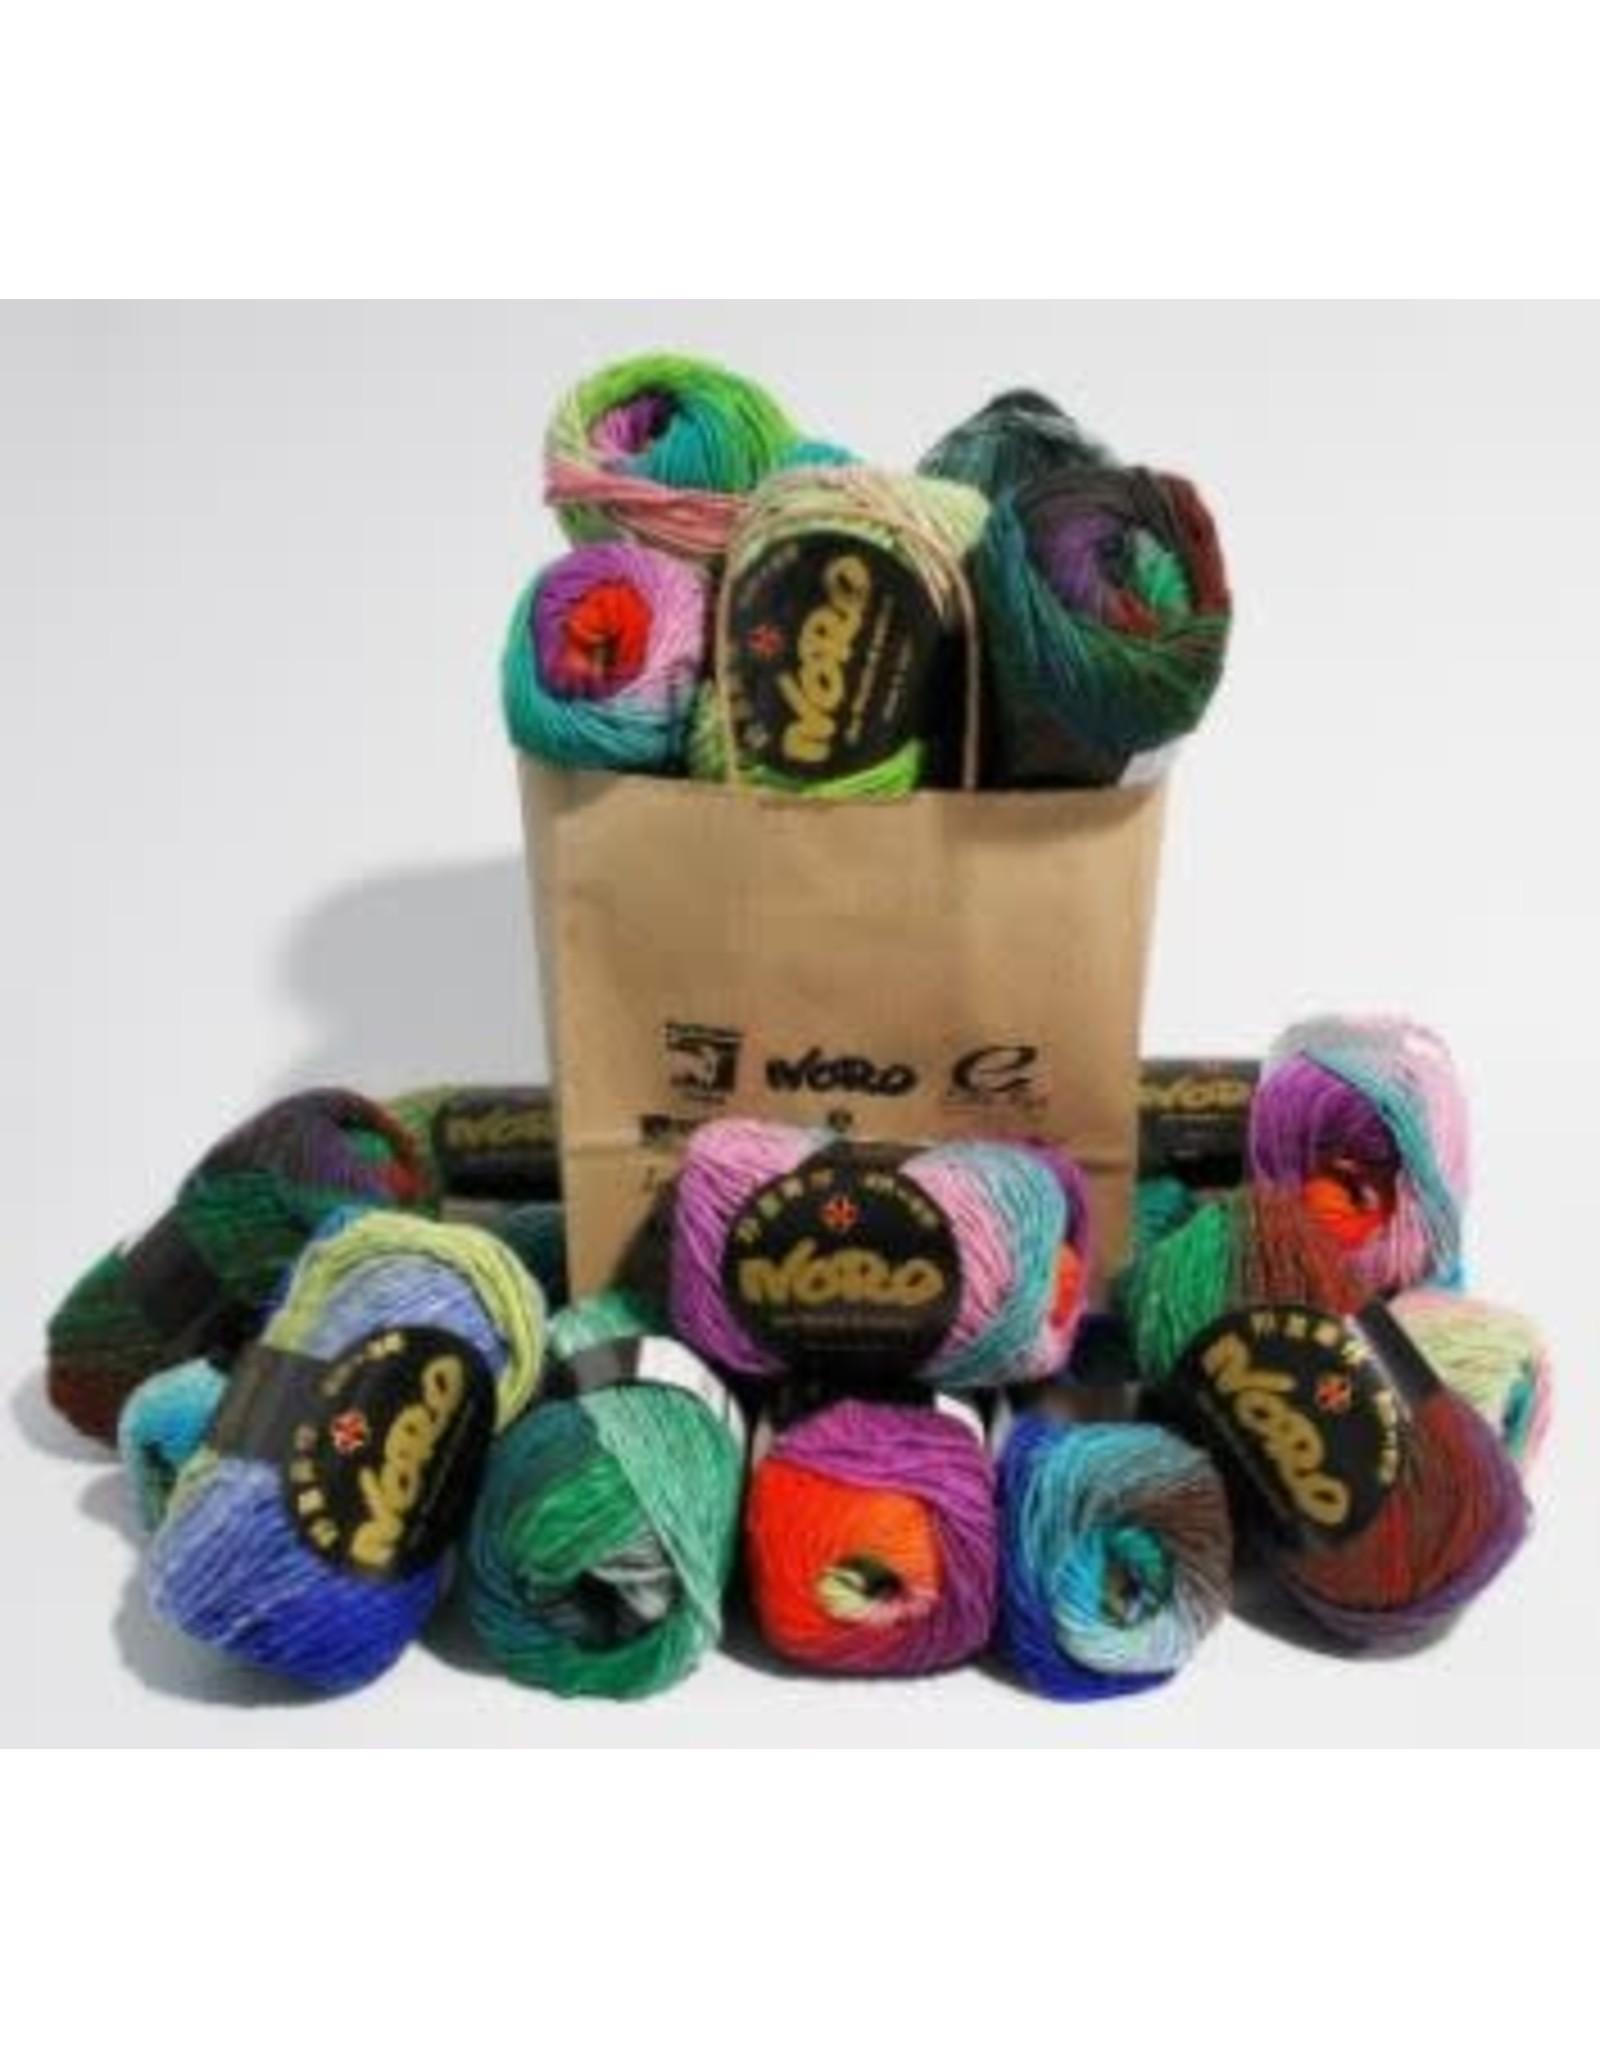 Noro Noro: Heart Blanket Kit